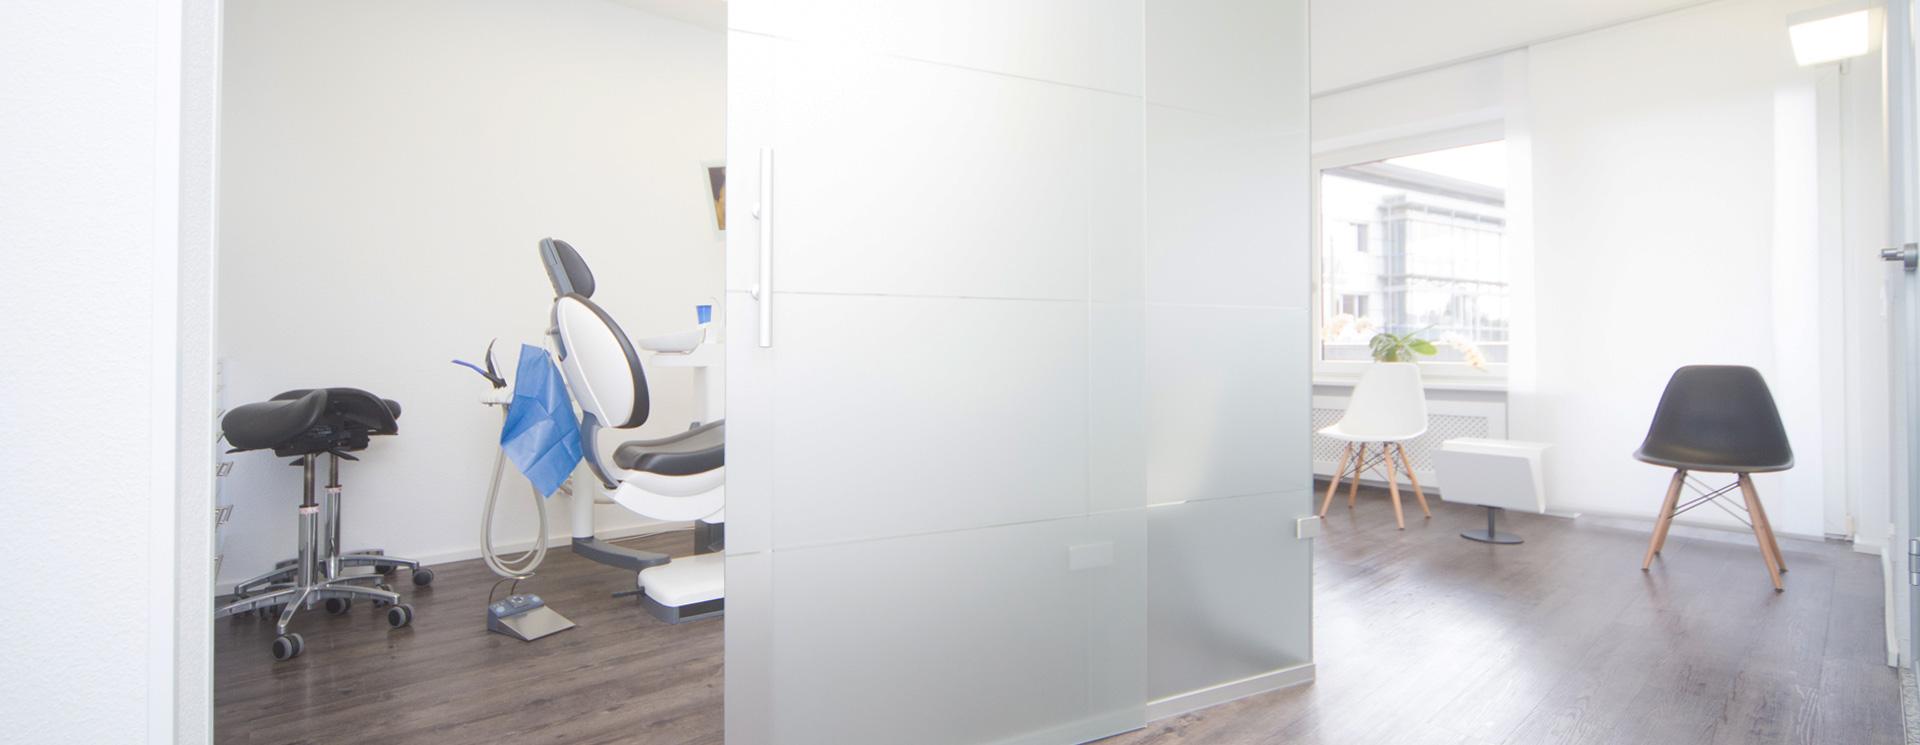 Zahnarzt Nürnberg | Dres. Meisel Praxisrundgang